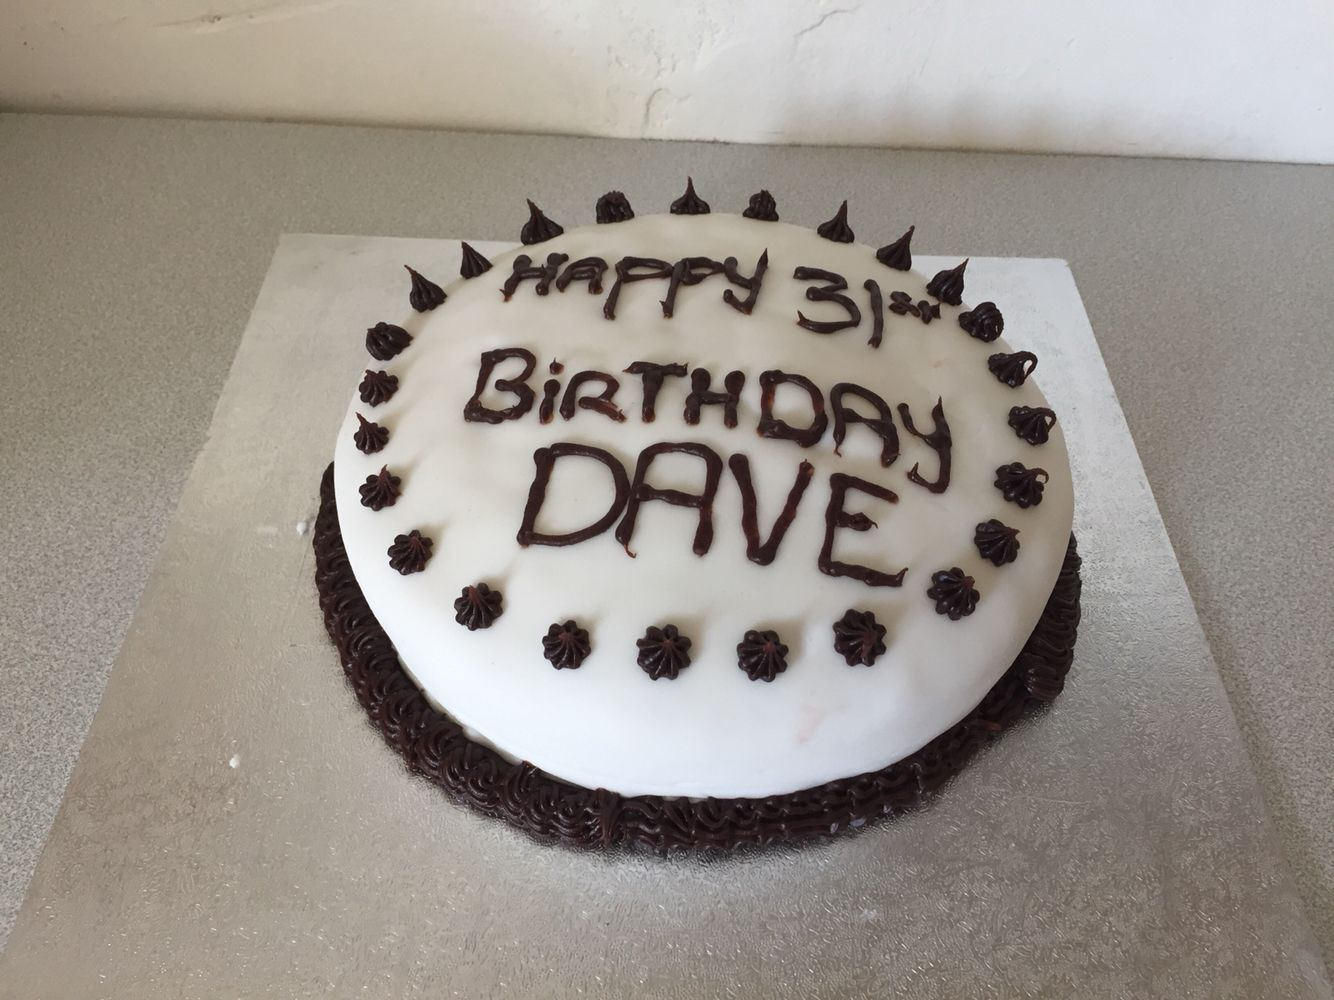 Birthday Cakes Ideas For My Husband ~ Birthday cake i made for my husband betty crocker marble cake